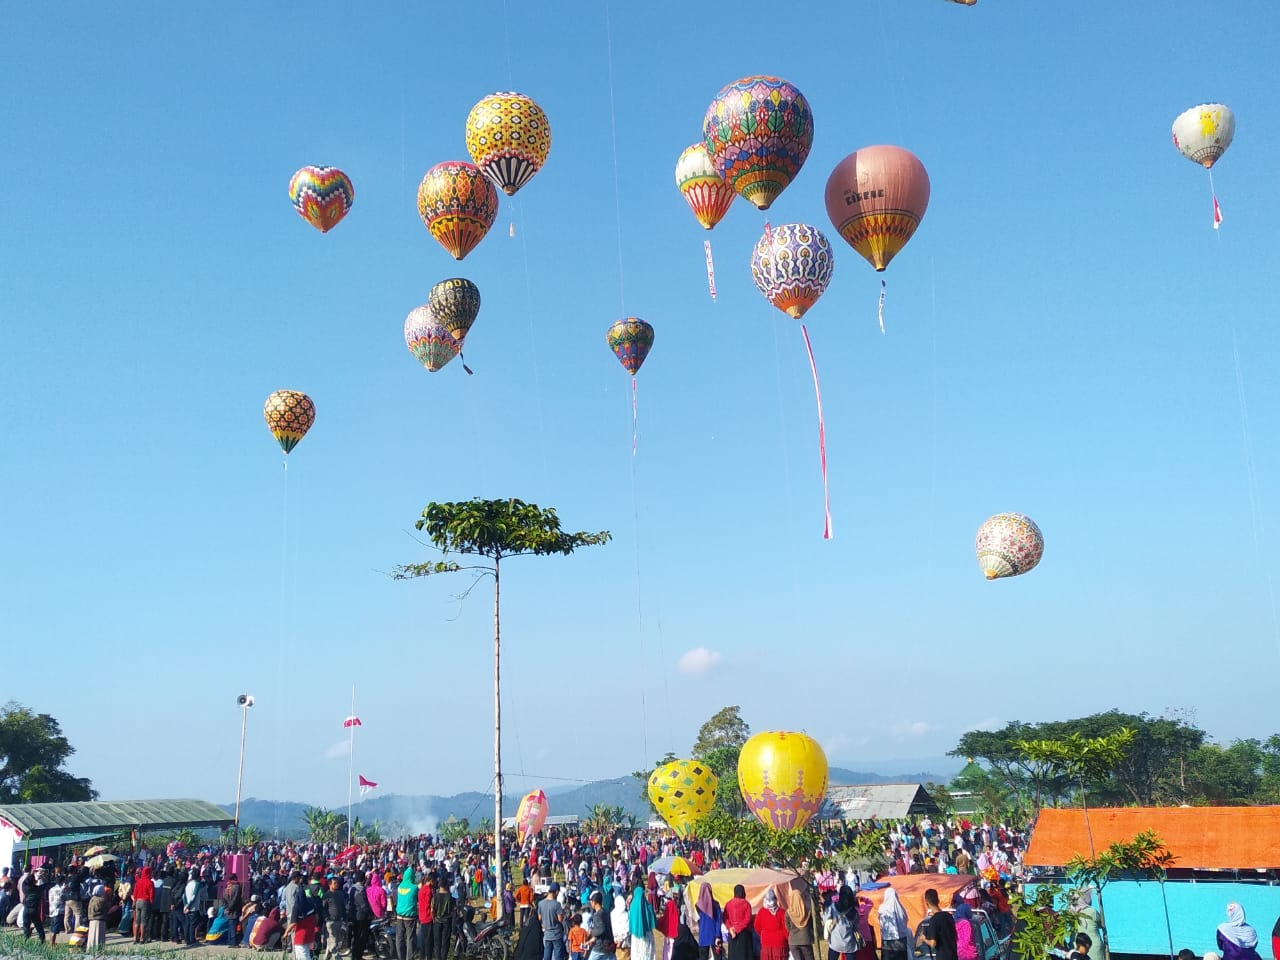 Festival Balon Udara dan Jalan Sehat Isi Kemeriahan Peringatan HUT RI Ke-74 di Sumberdalem